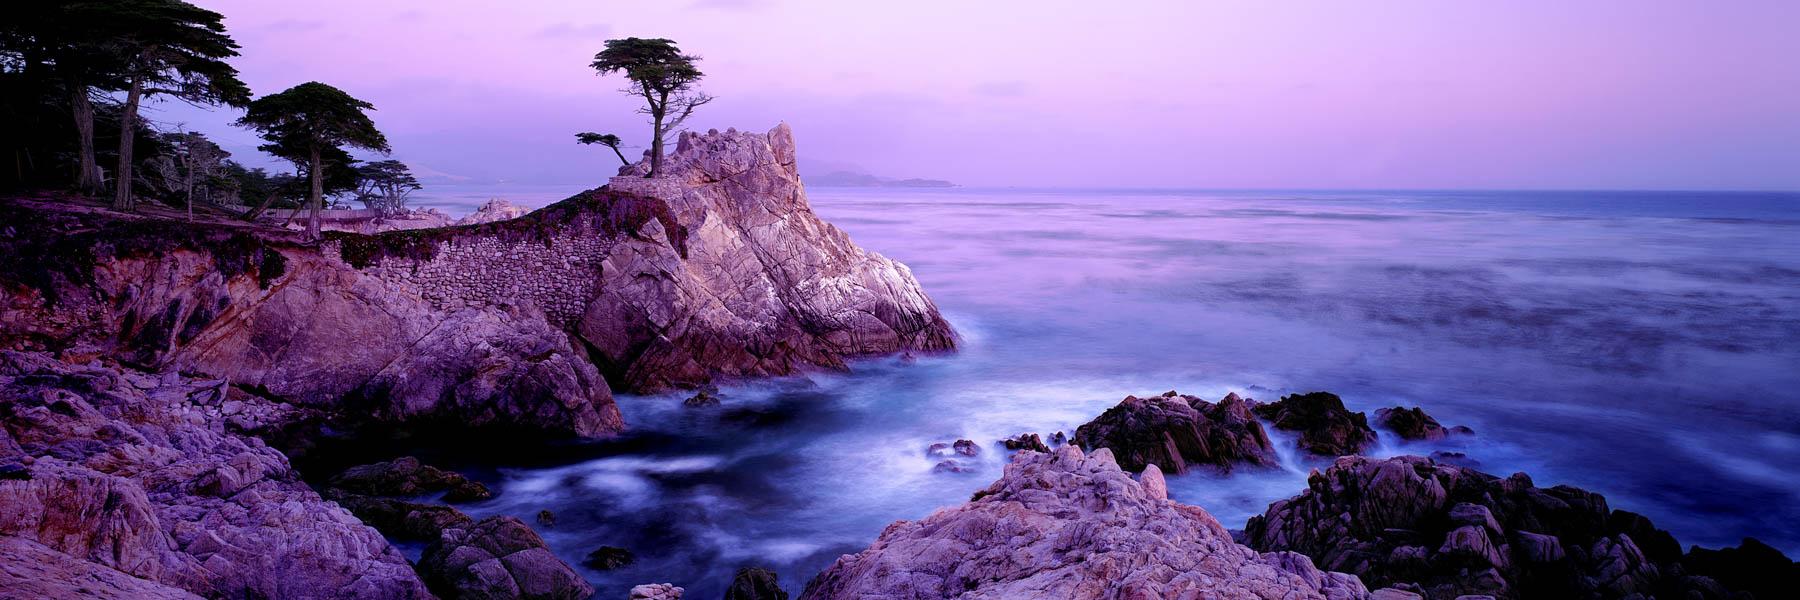 A dreamy pastel sunrise over The Lone Cypress, Carmel, California, USA.